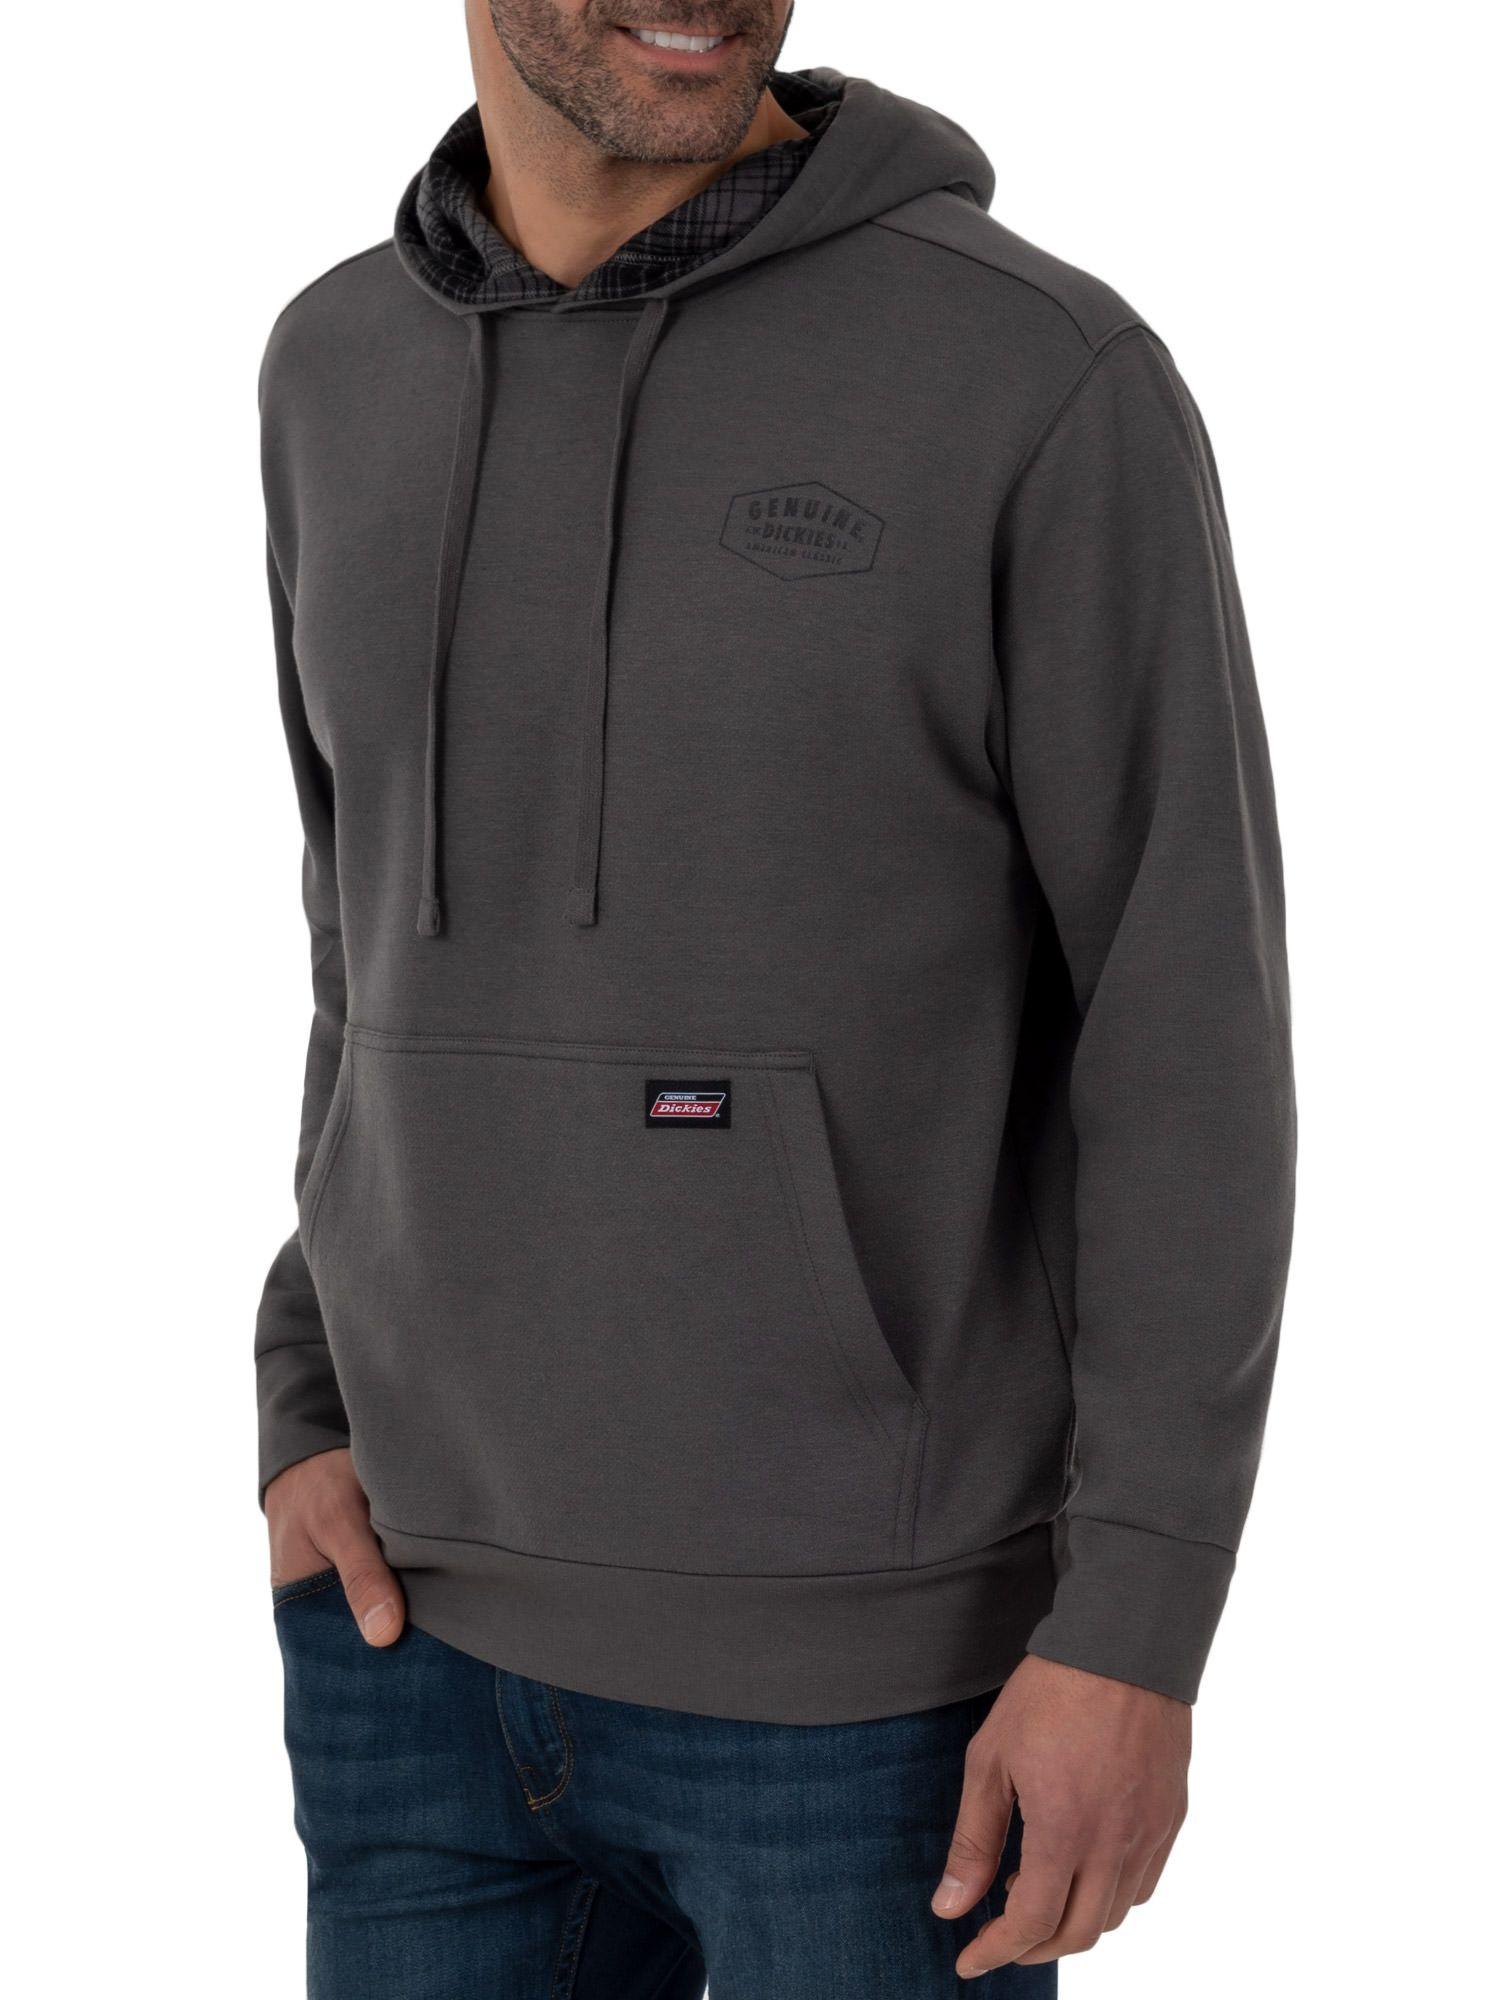 Dickies Genuine Dickies Men S Fleece Pullover With Flannel Lined Hoodie Walmart Com Lined Hoodie Mens Fleece Fleece Pullover [ 2000 x 1500 Pixel ]